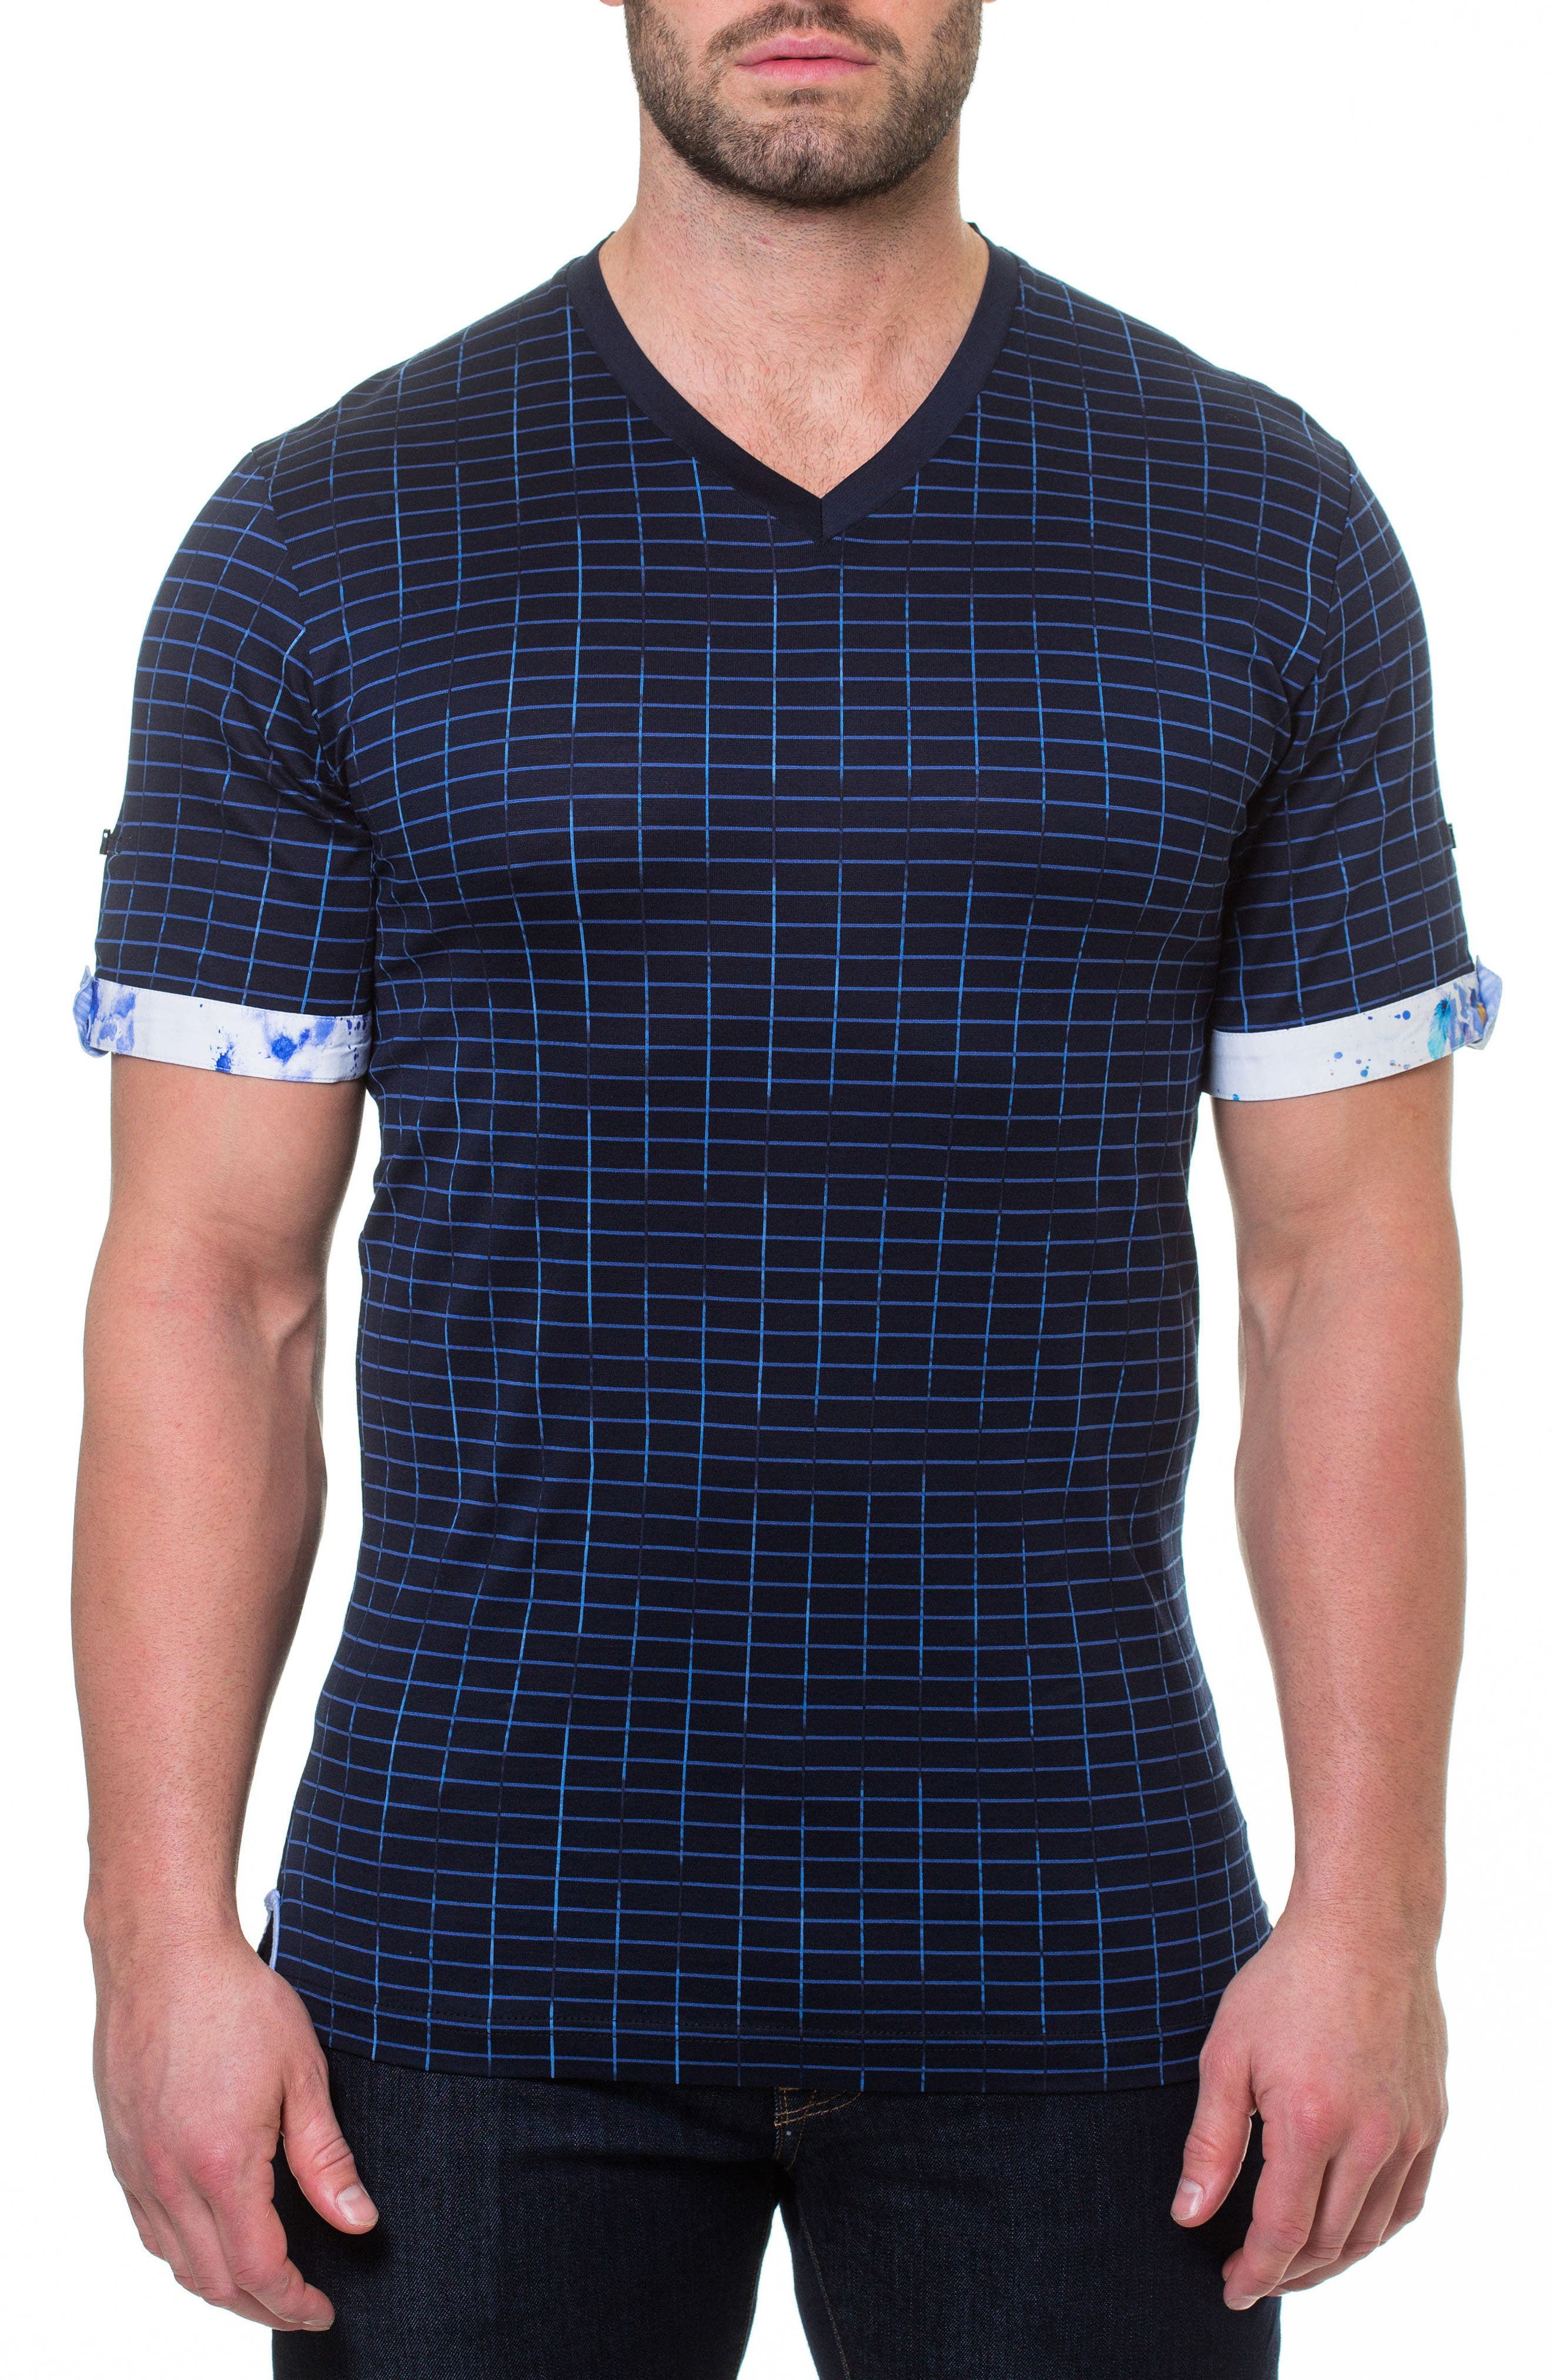 Maceoo Short Sleeve V-Neck Framework T-Shirt, Blue